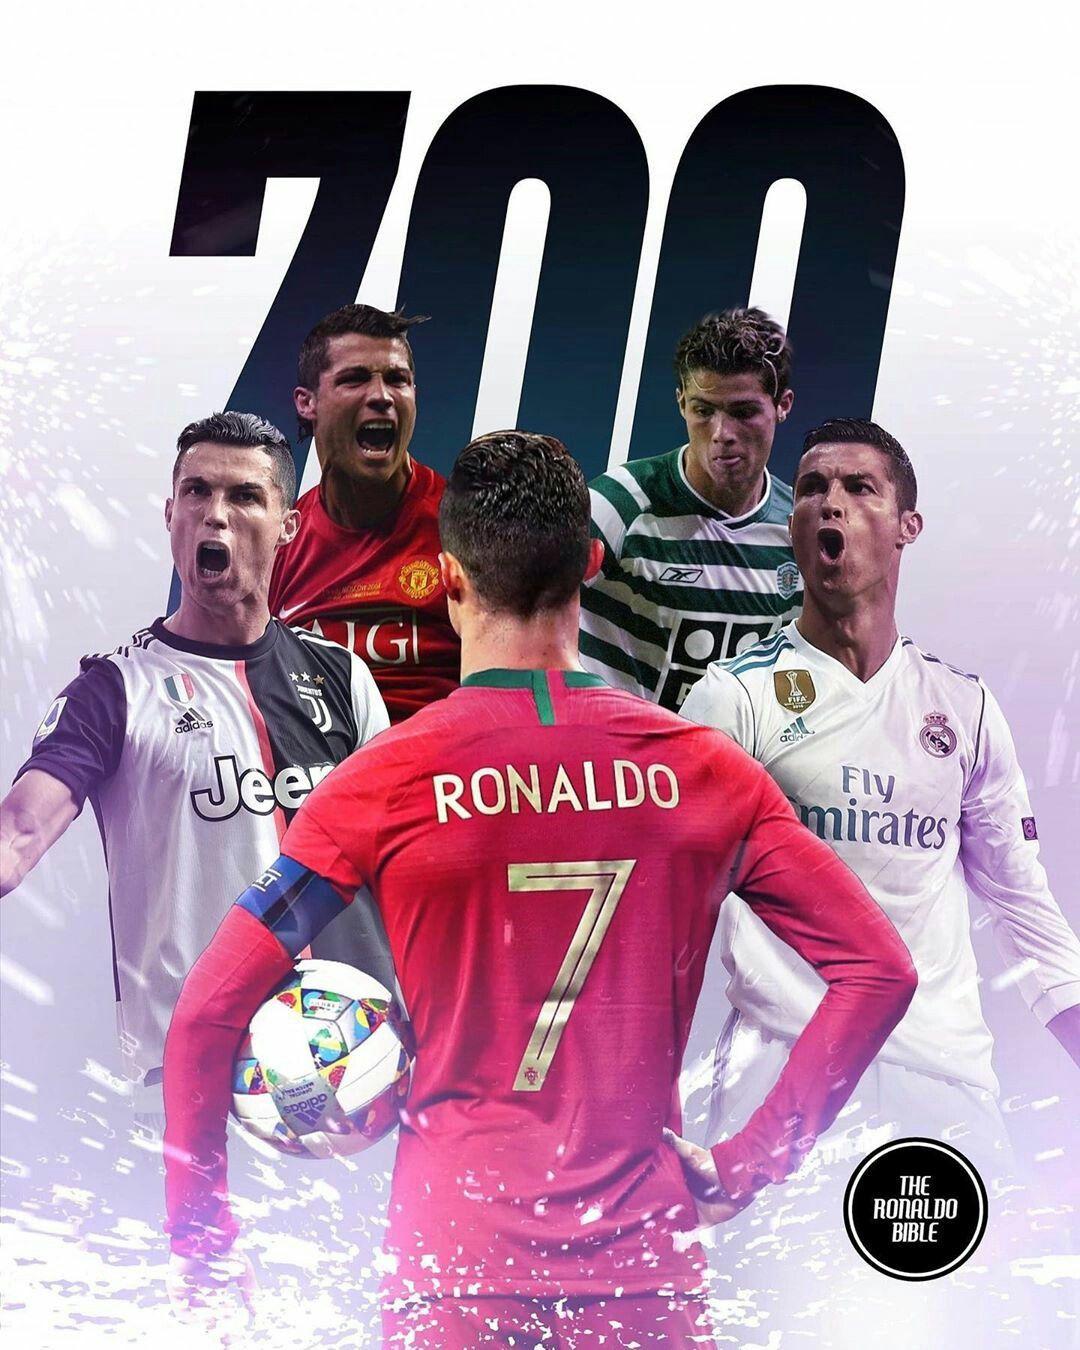 Barcelona Vs Real Madrid Wallpaper Barcelona Vs Real Madrid In 2020 Ronaldo Crstiano Ronaldo Cristiano Ronaldo Juventus